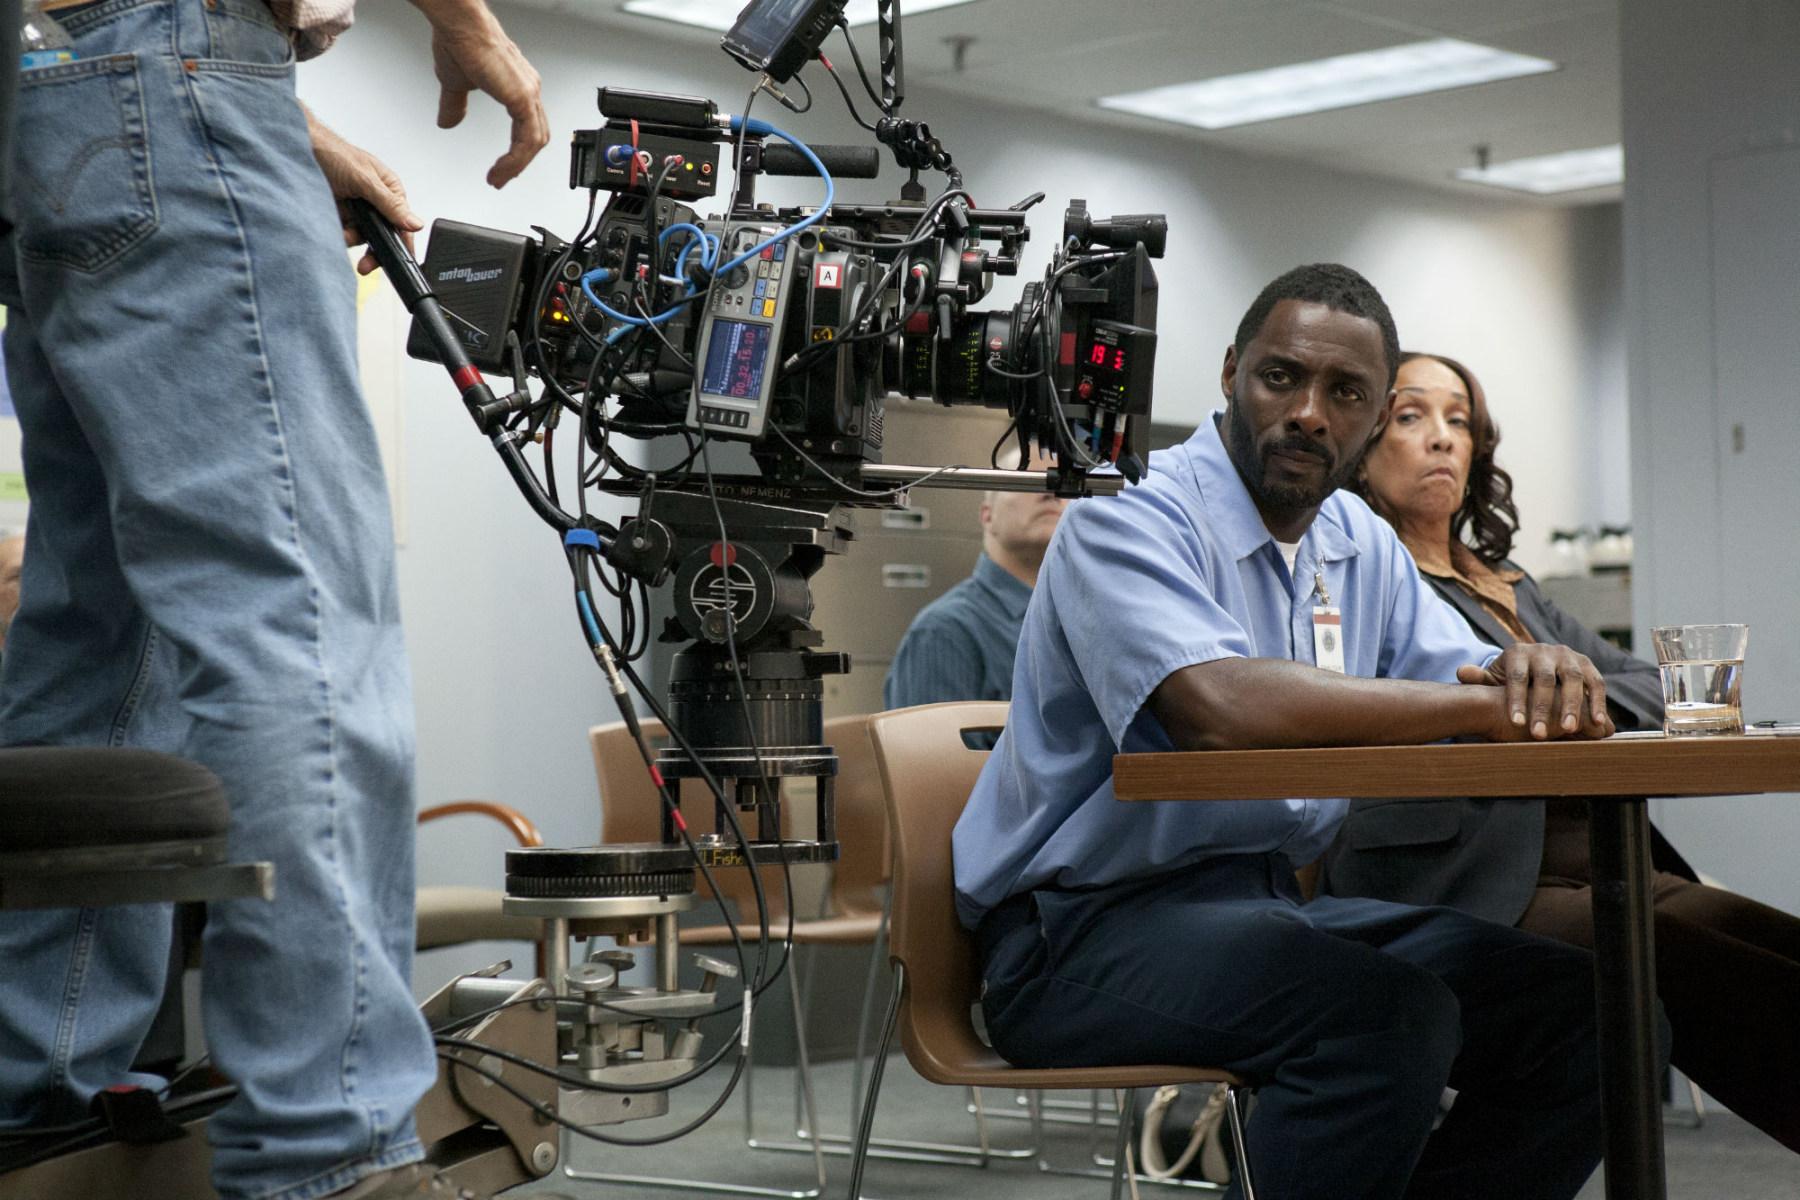 Idris Elba : No Good Deed (2014) Behind the Scenes